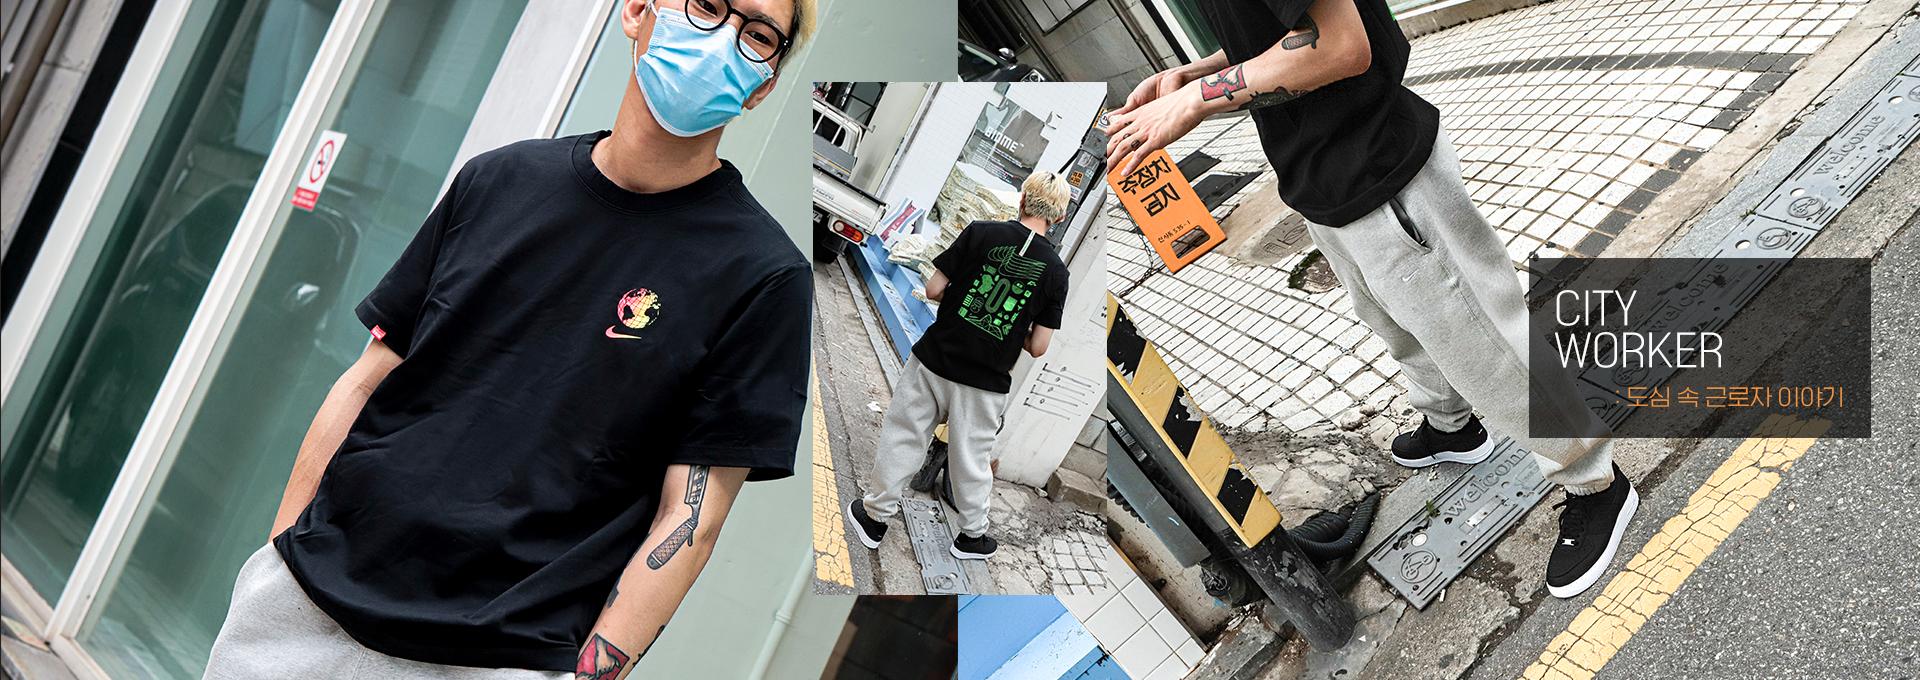 CITYWORKER_메인배너_PC